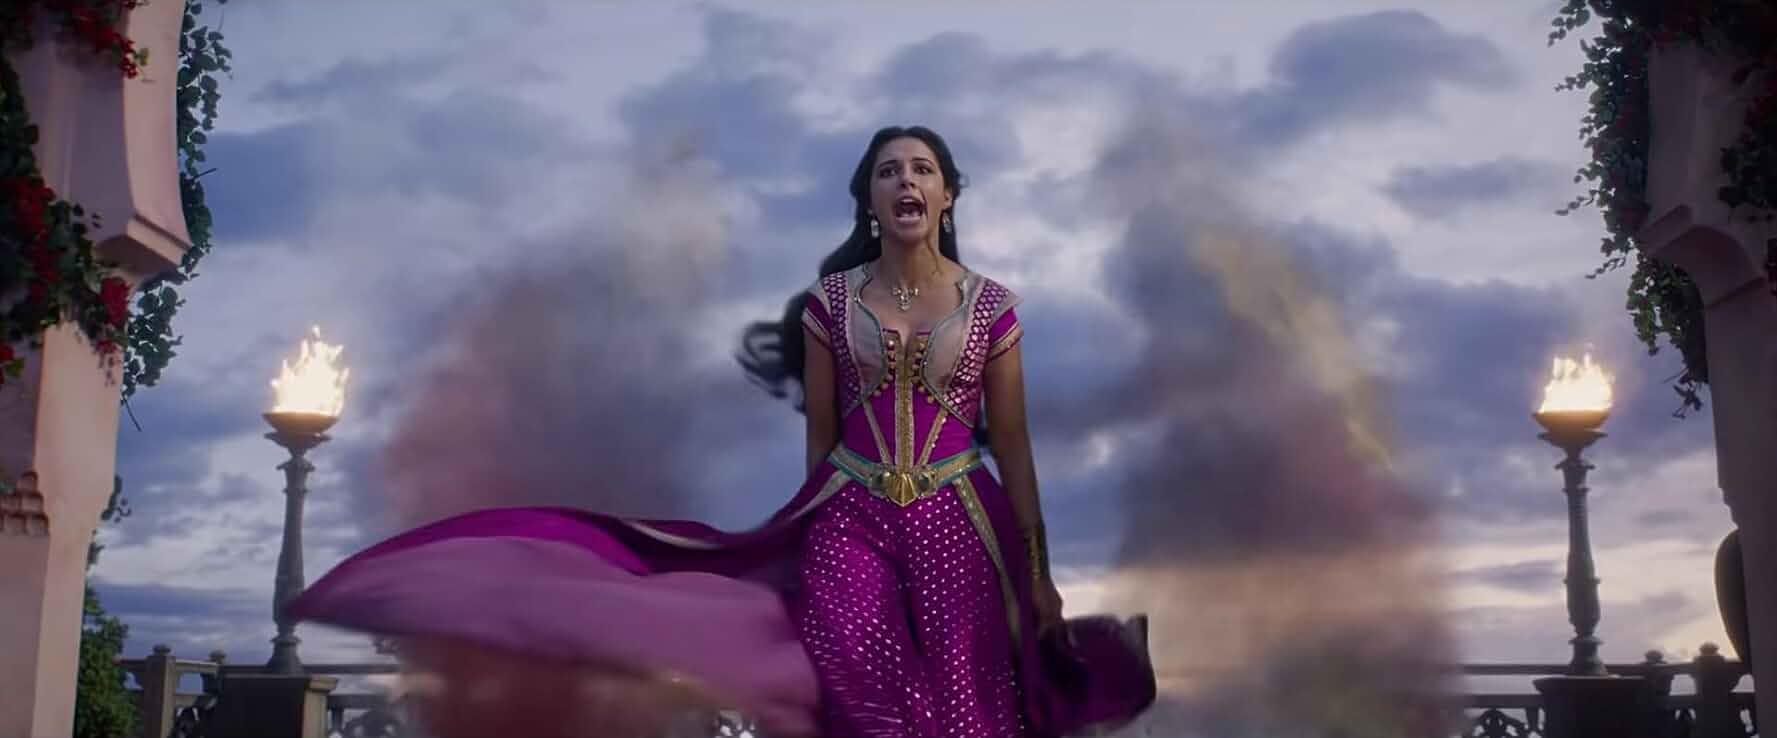 Aladdin (2019) in Hindi